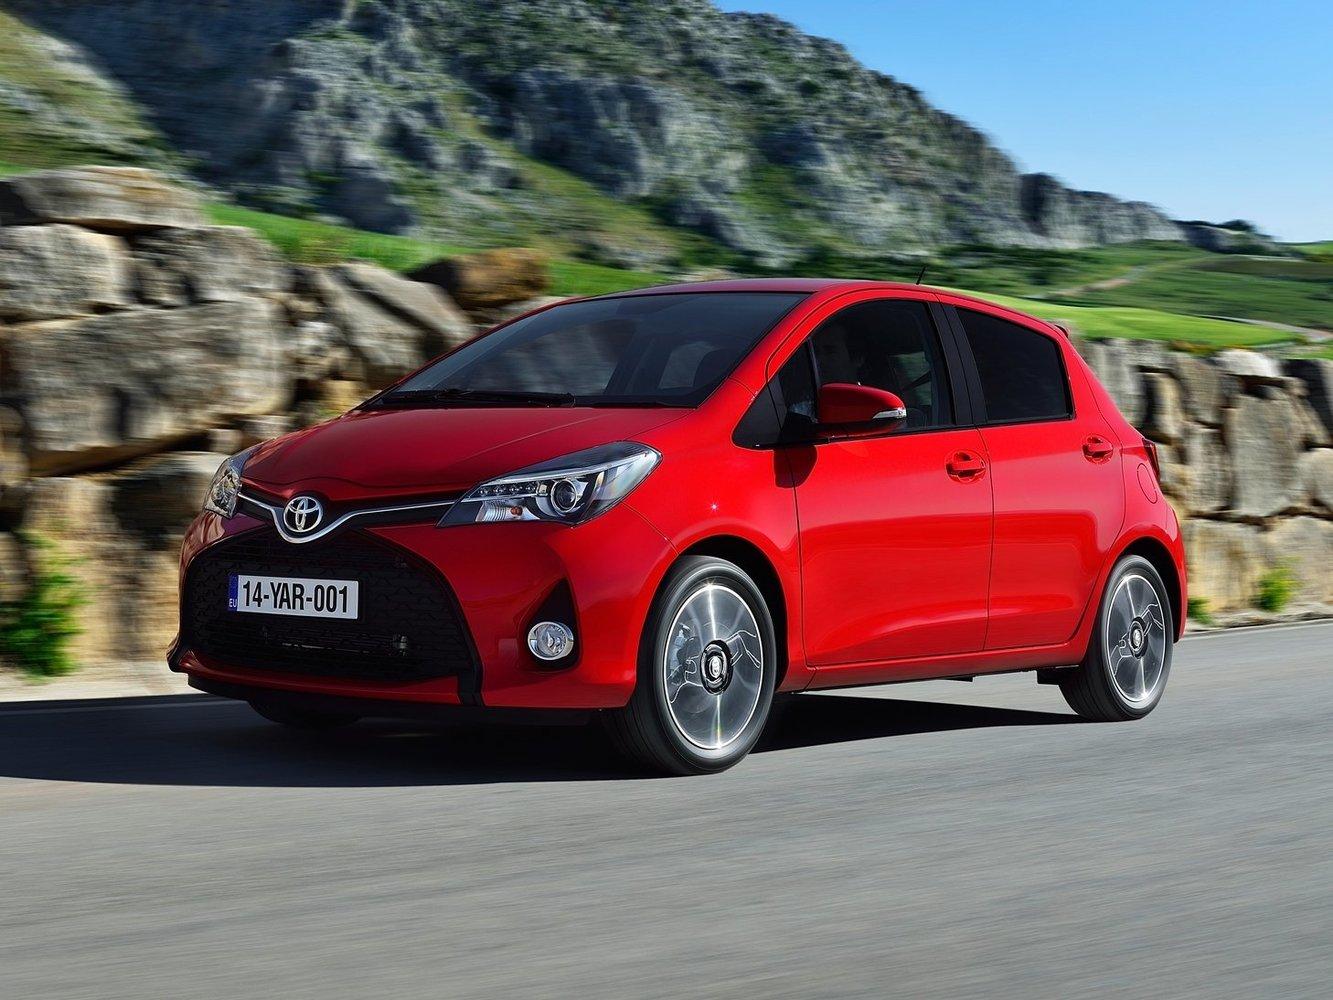 Nouvelle Toyota Yaris | Upcomingcarshq.com